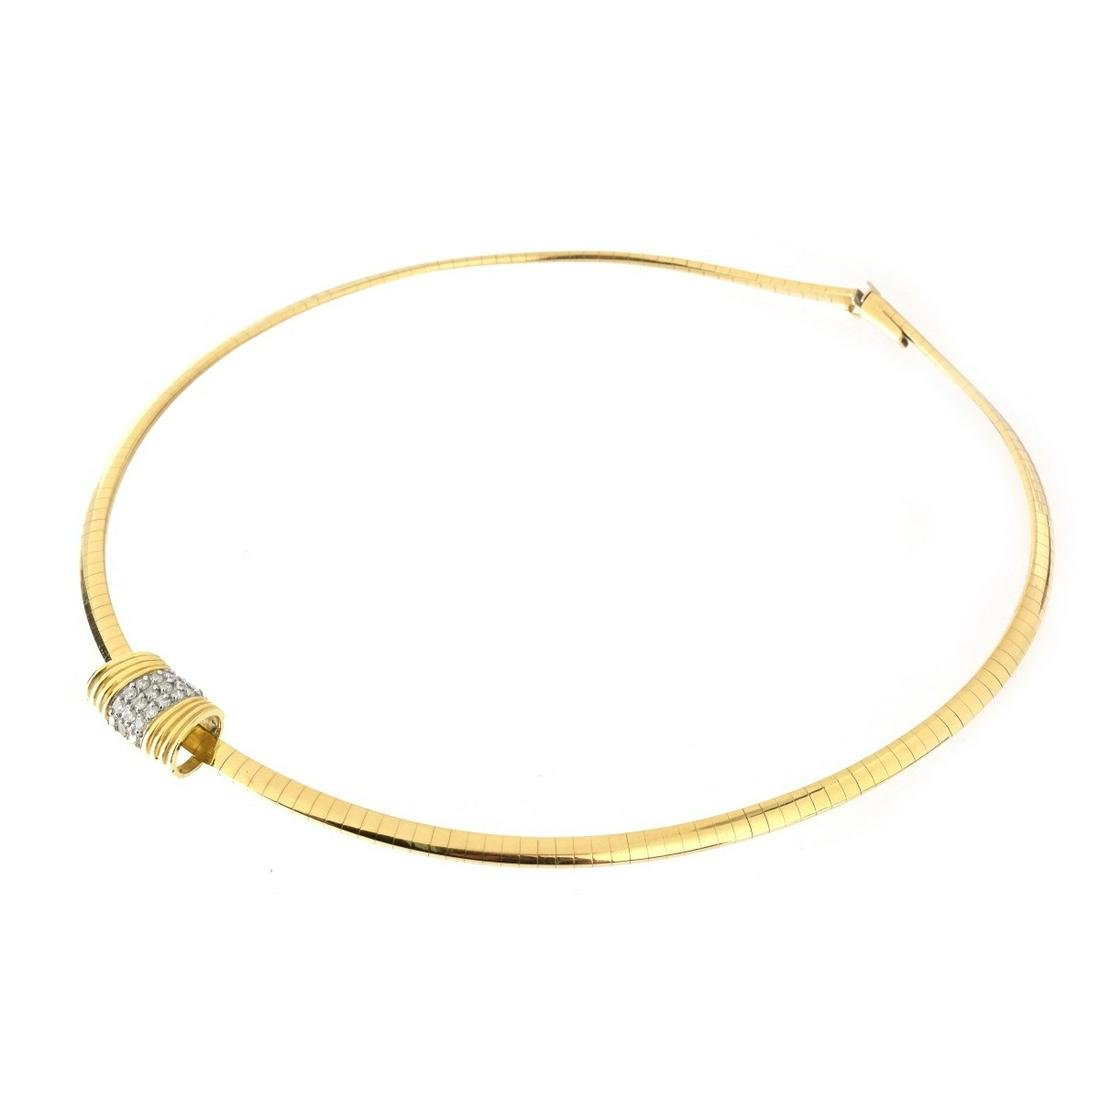 14K and Diamond Omega Necklace